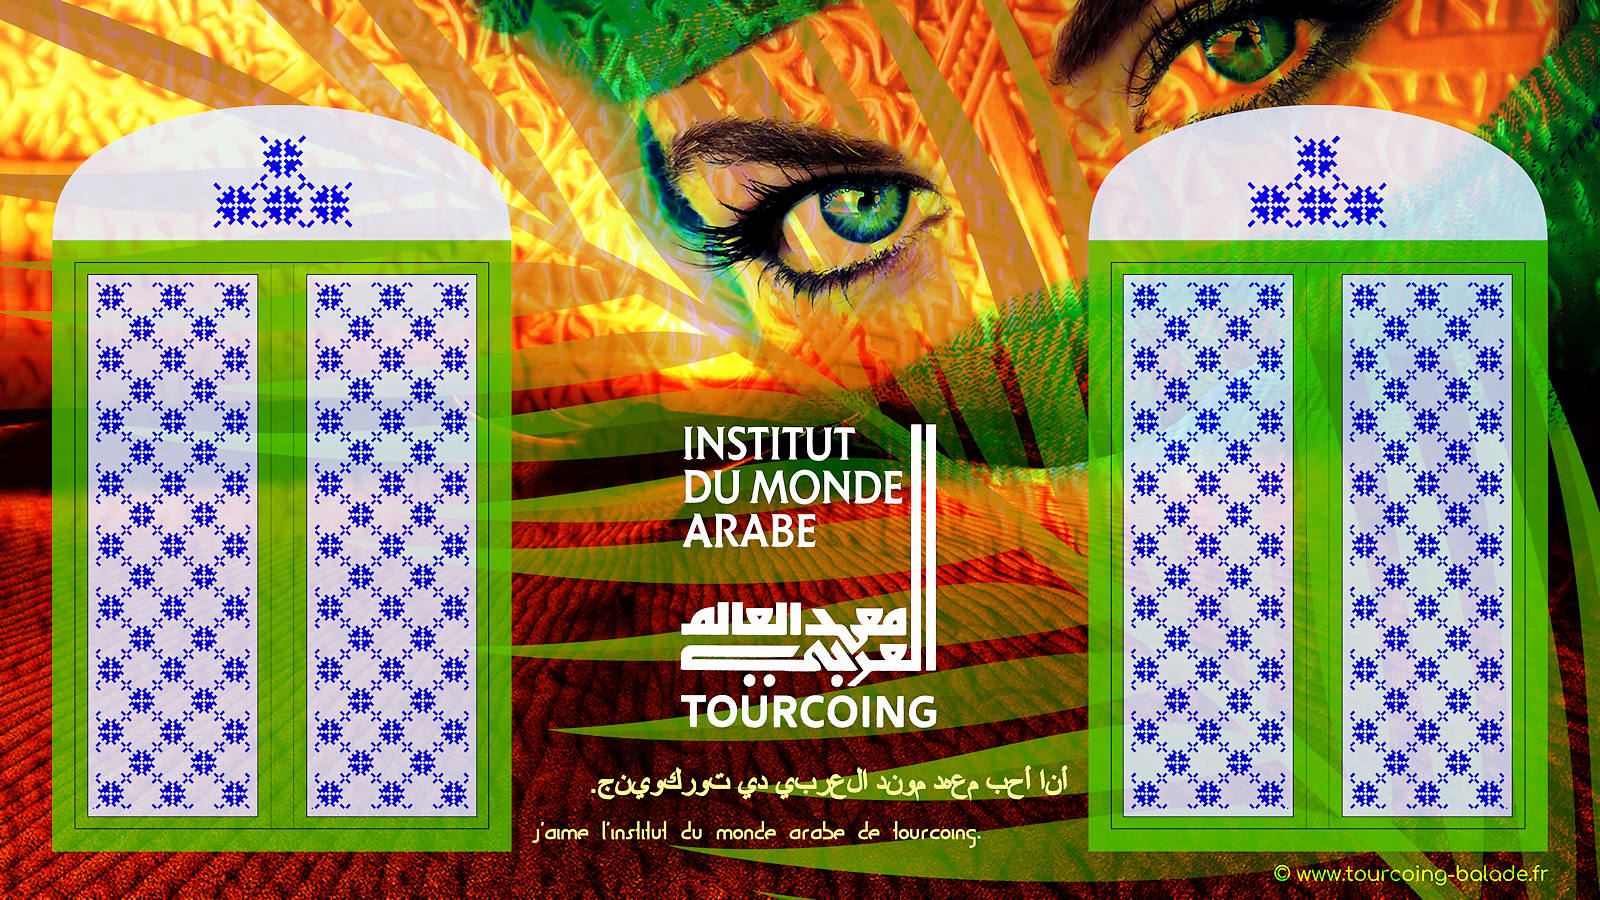 Institut du Monde Arabe, Tourcoing.